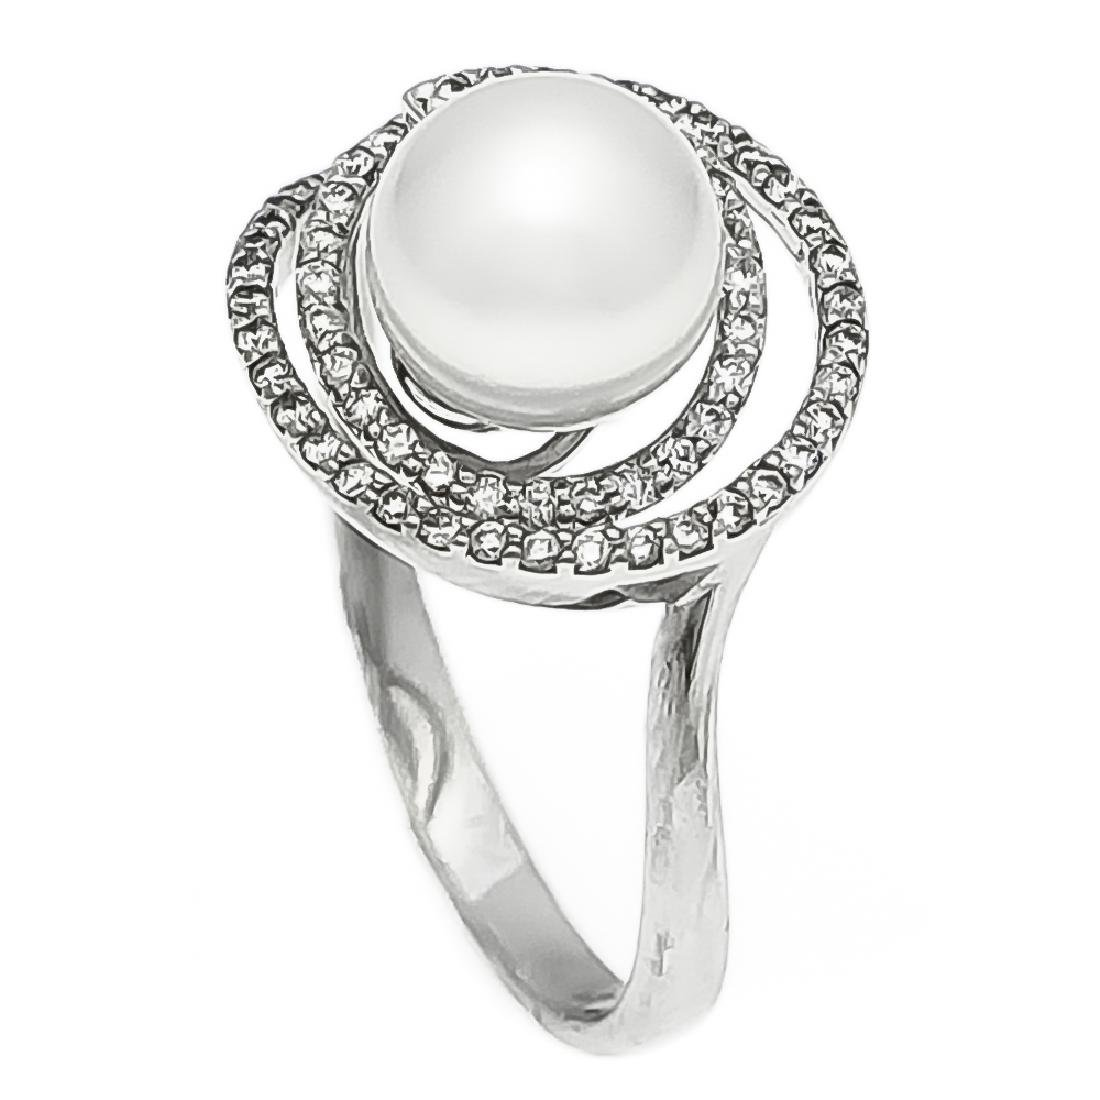 Akoya-Brillant-Ring WG 585/000 mit einer Akoya-Perle